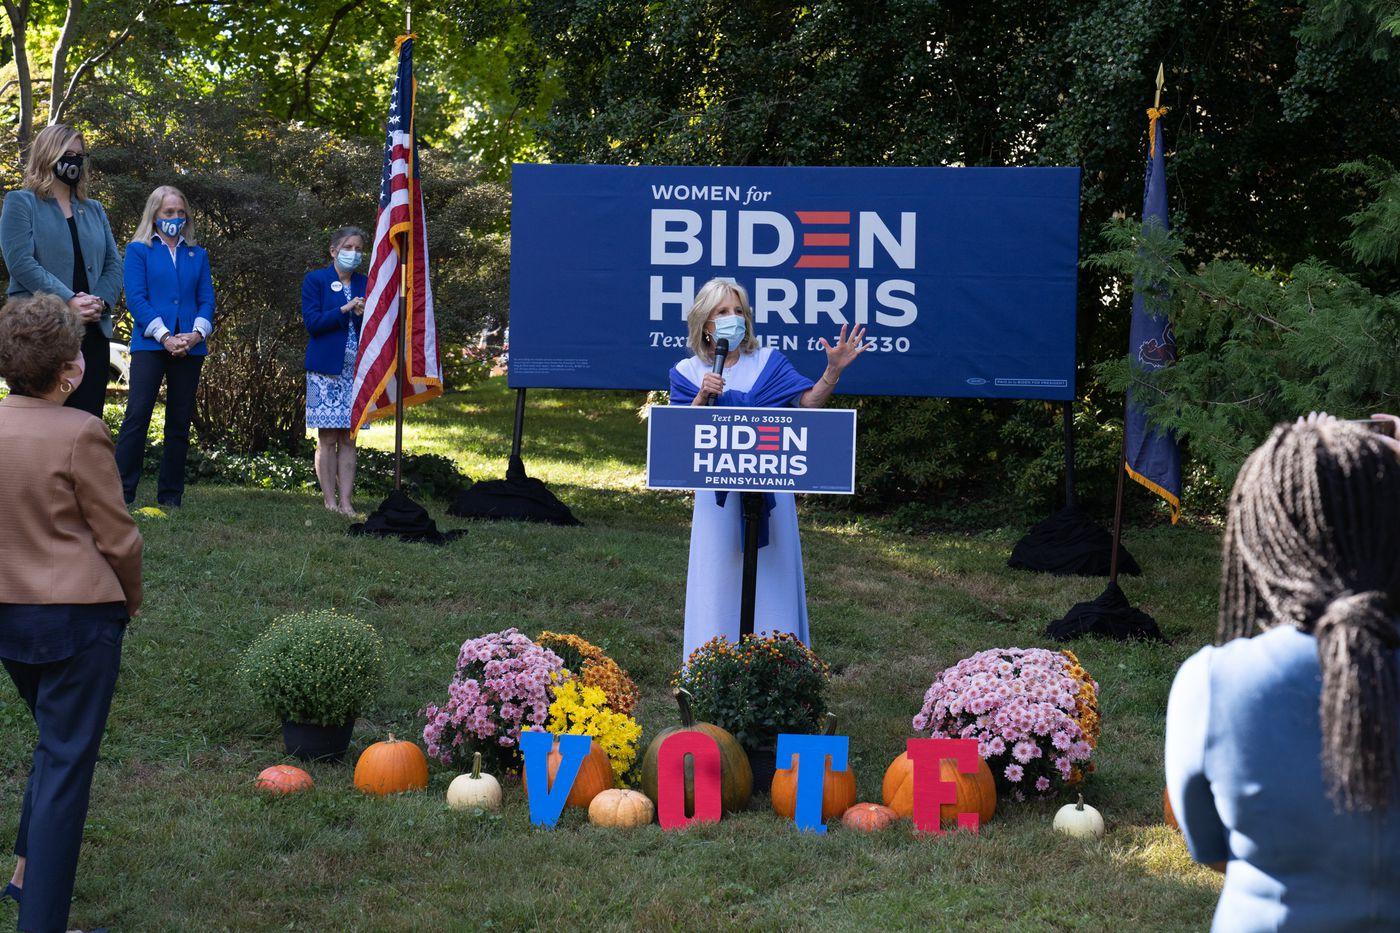 Jill Biden Talks About Importance of Women in Campaign Swing through Swarthmore